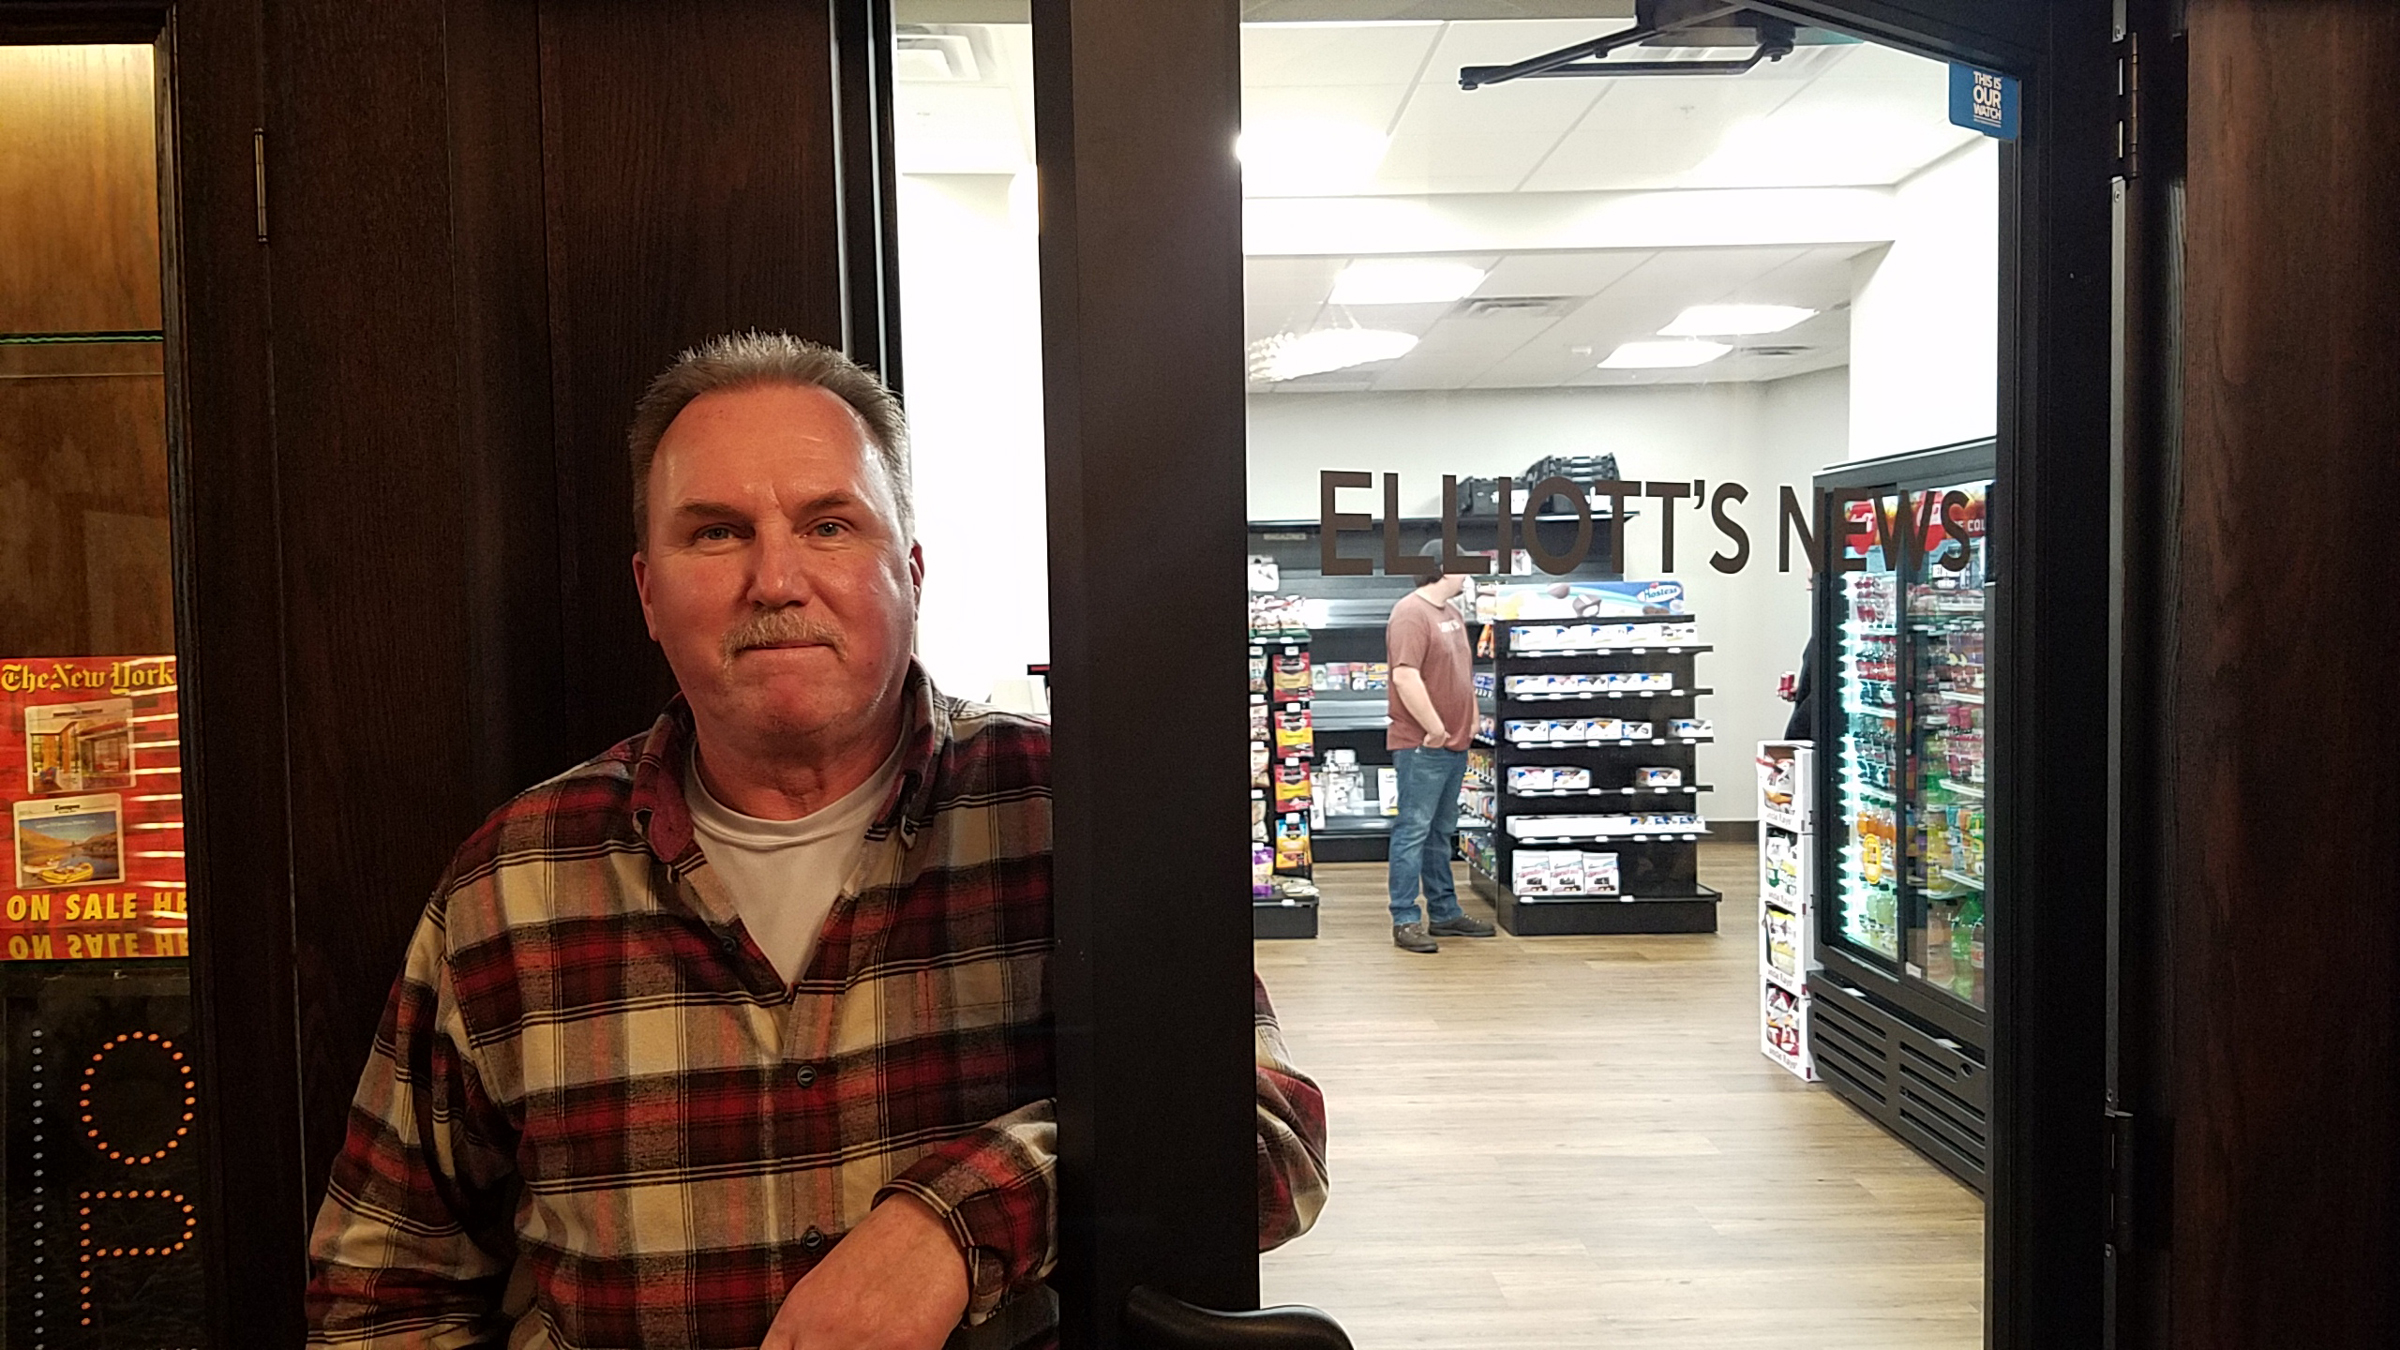 Bill Bennett is excited to re-open Elliott's Newsstand in McKay Tower.